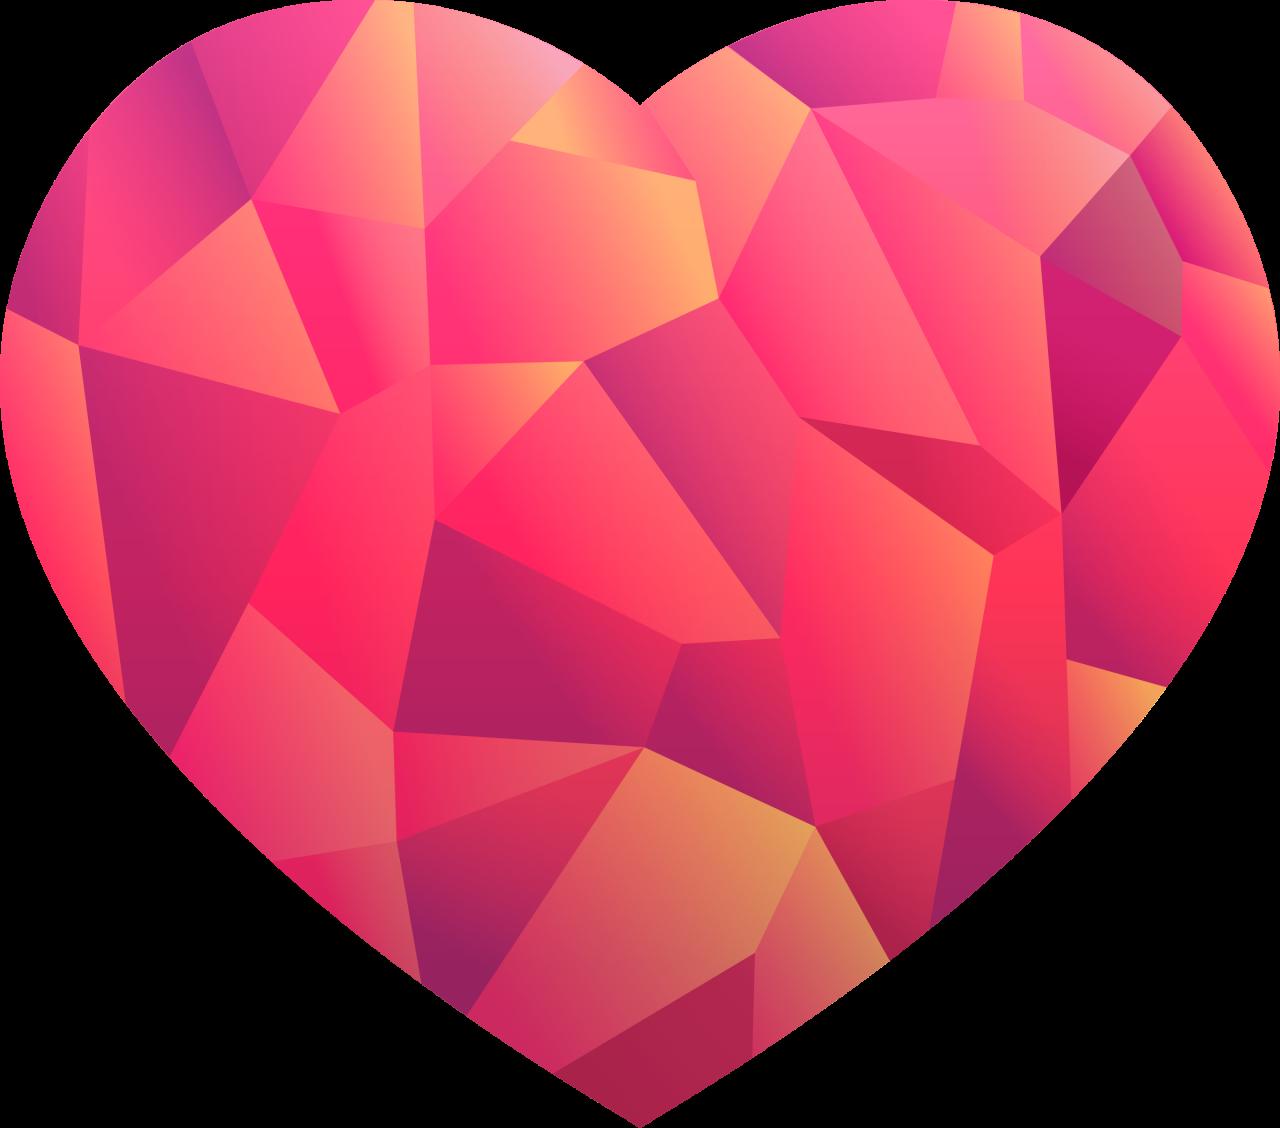 Love Heart Design PNG Image